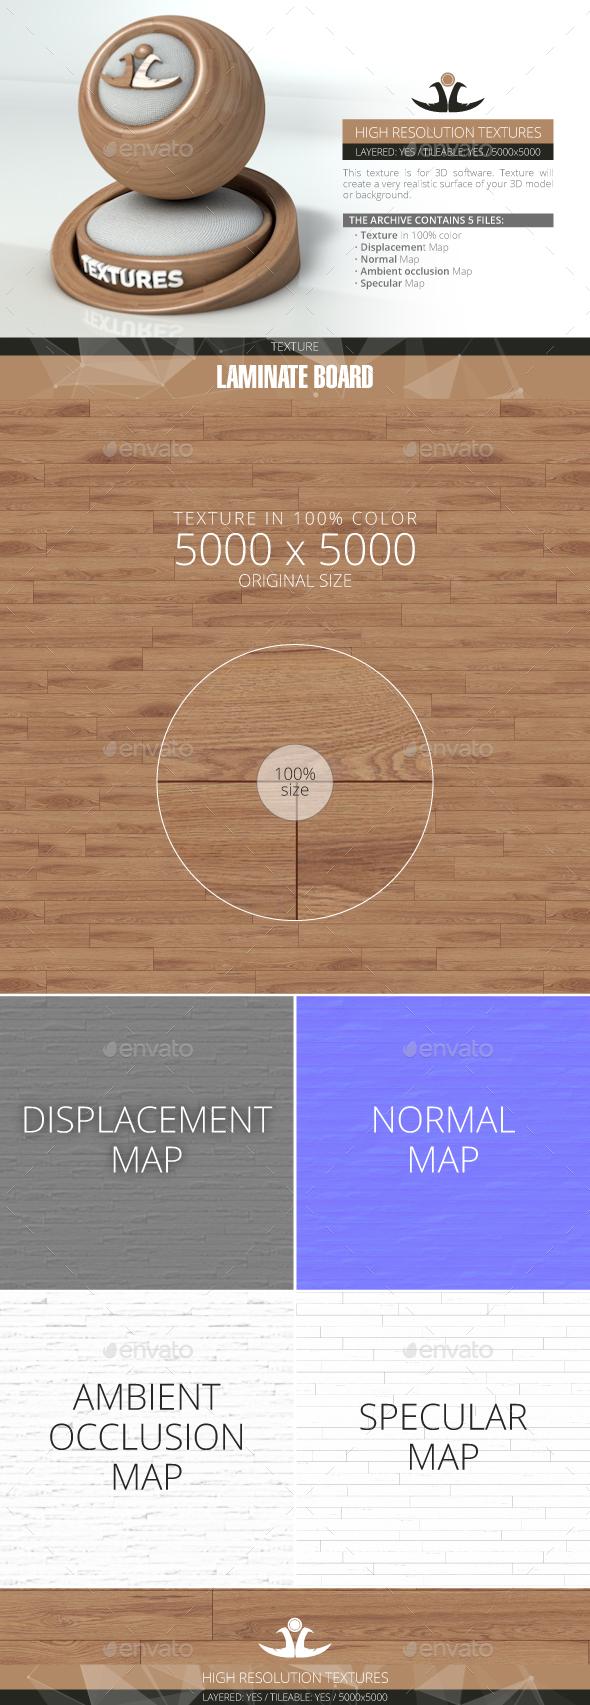 Laminate Board 40 - 3DOcean Item for Sale